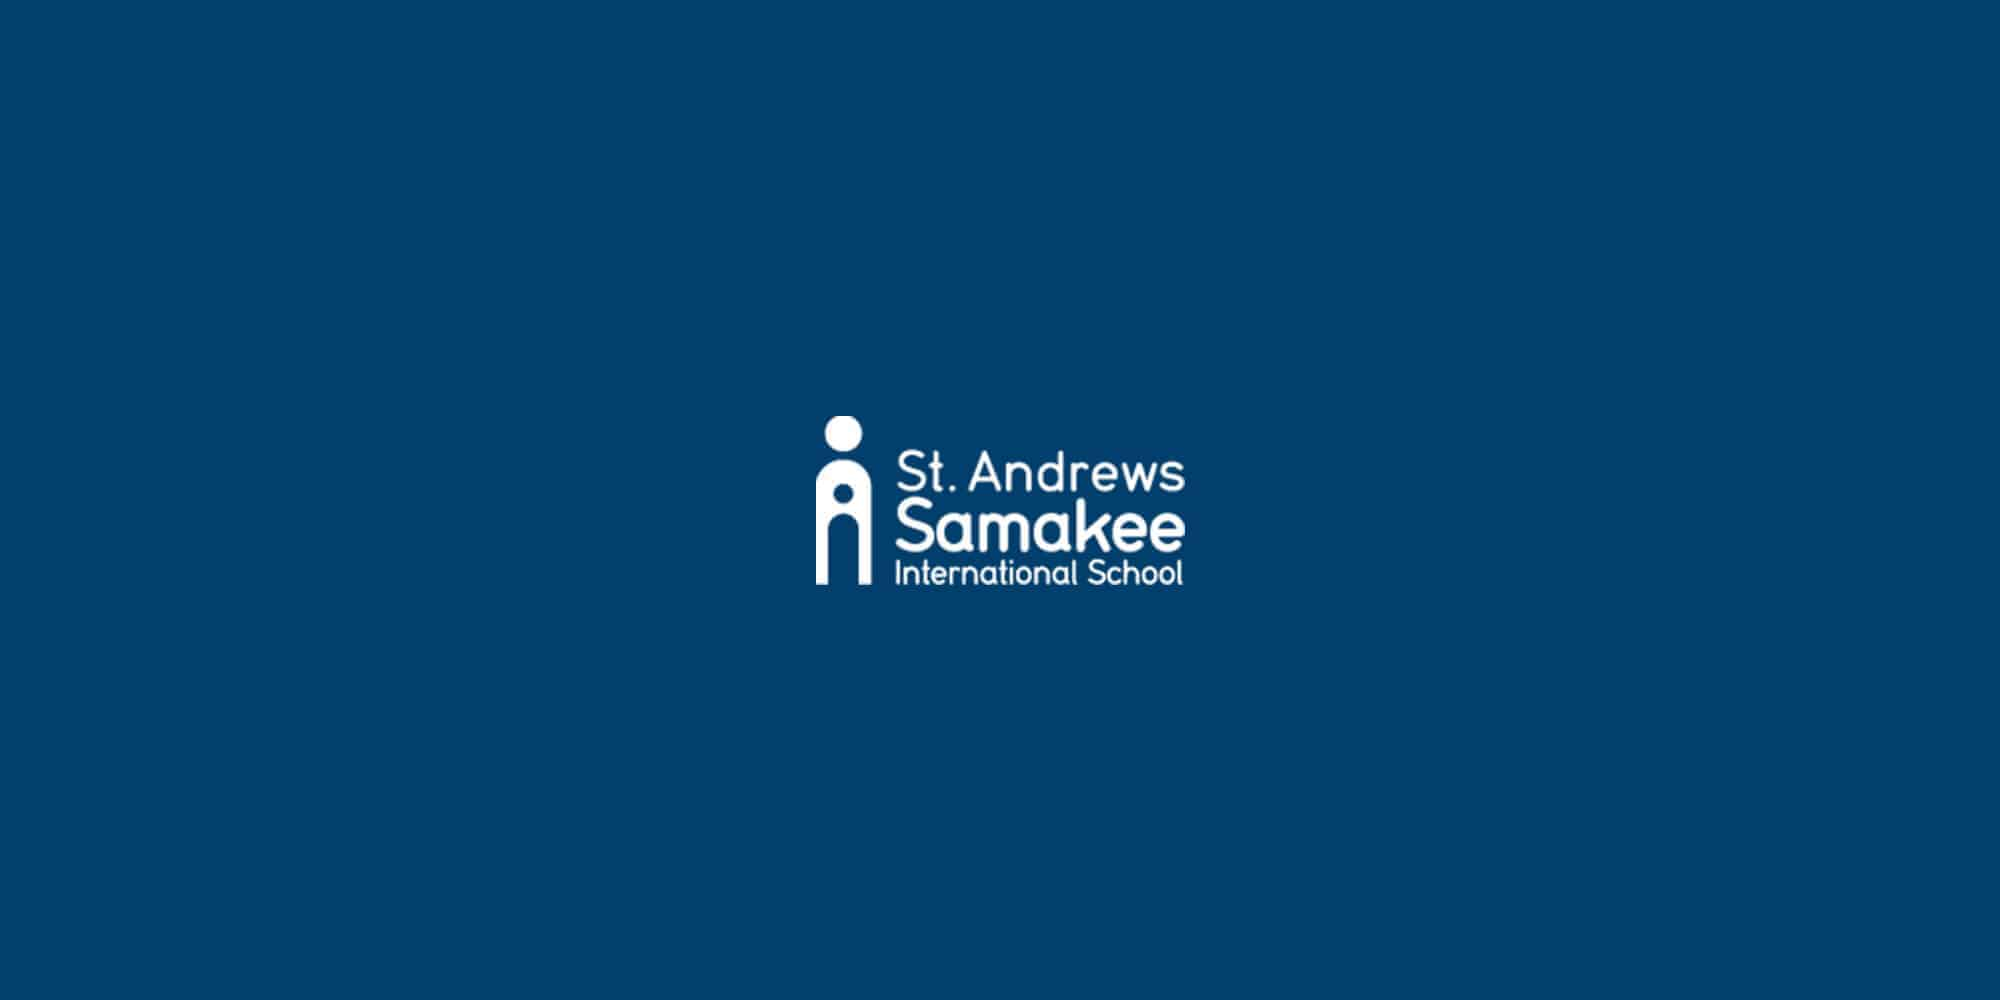 st-andrews-samakee-website